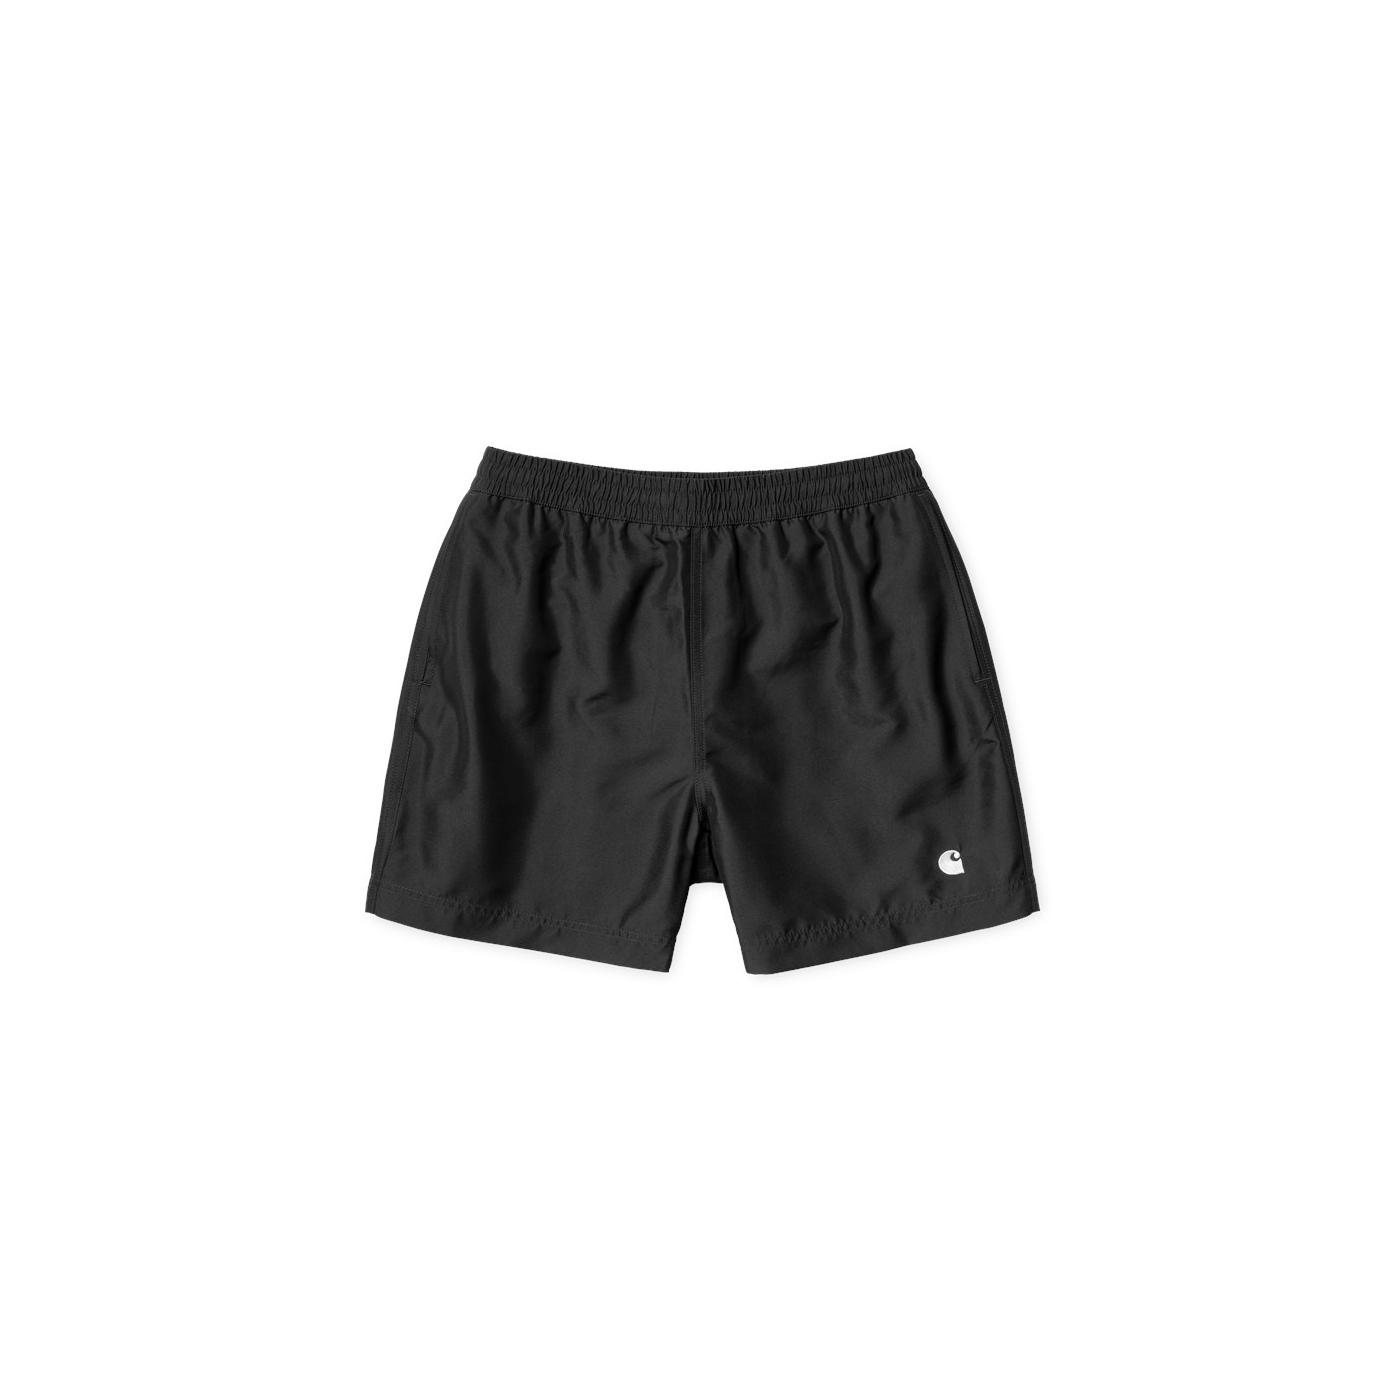 6ee061fe35 Short De Bain Carhartt Cay Swim Black / White   Alltricks.com